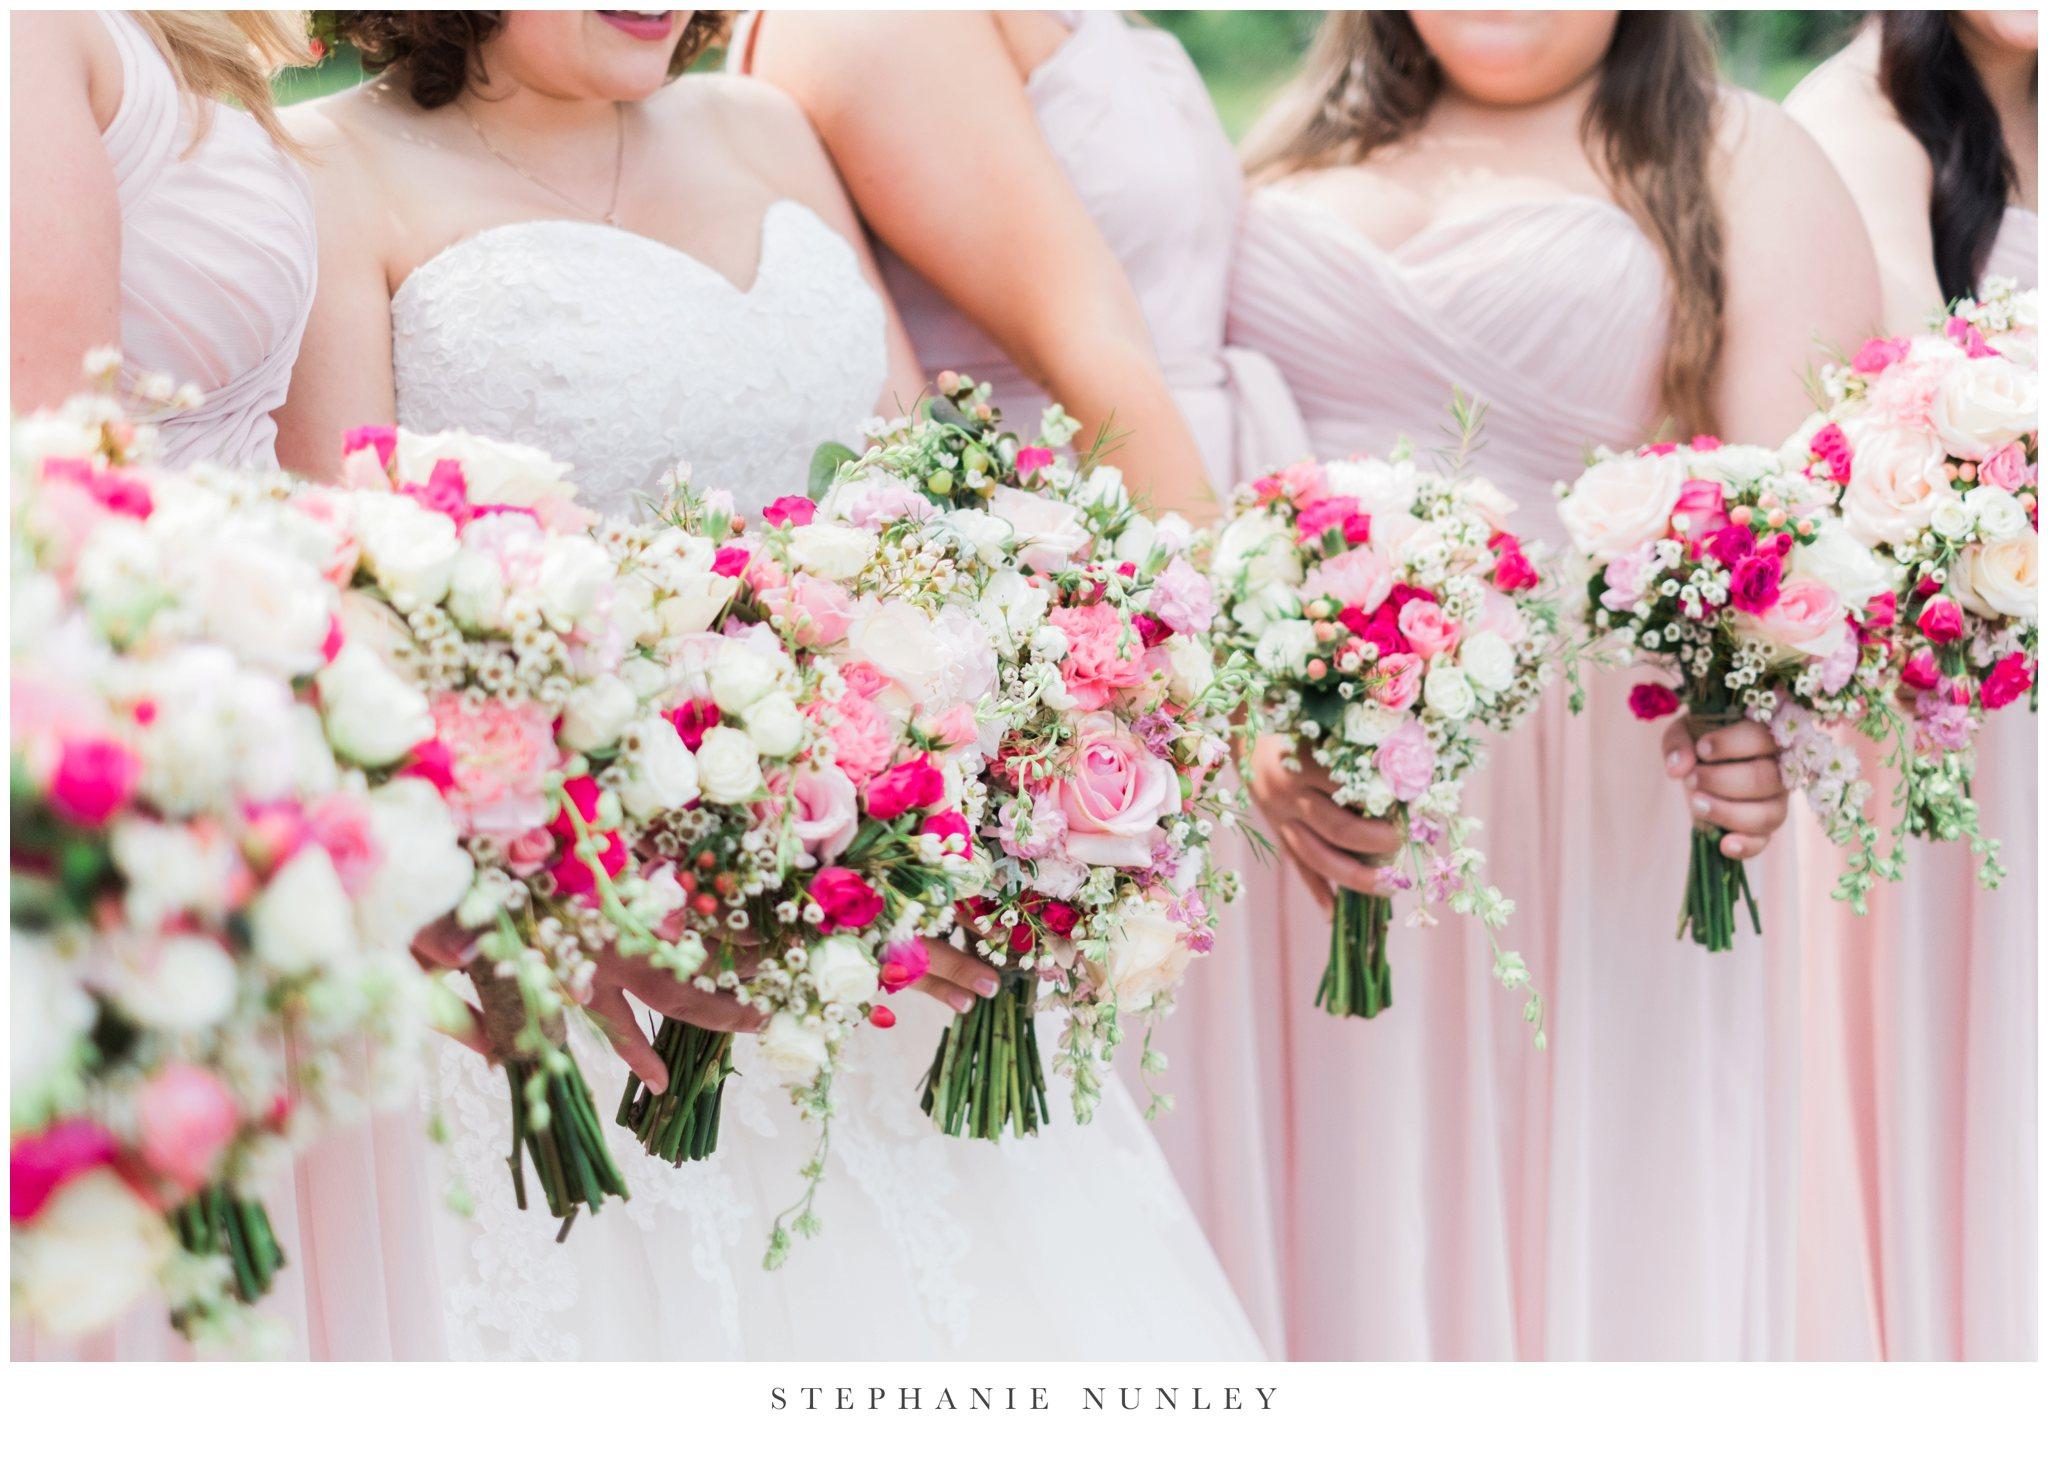 romantic-outdoor-wedding-with-flower-crown-0080.jpg